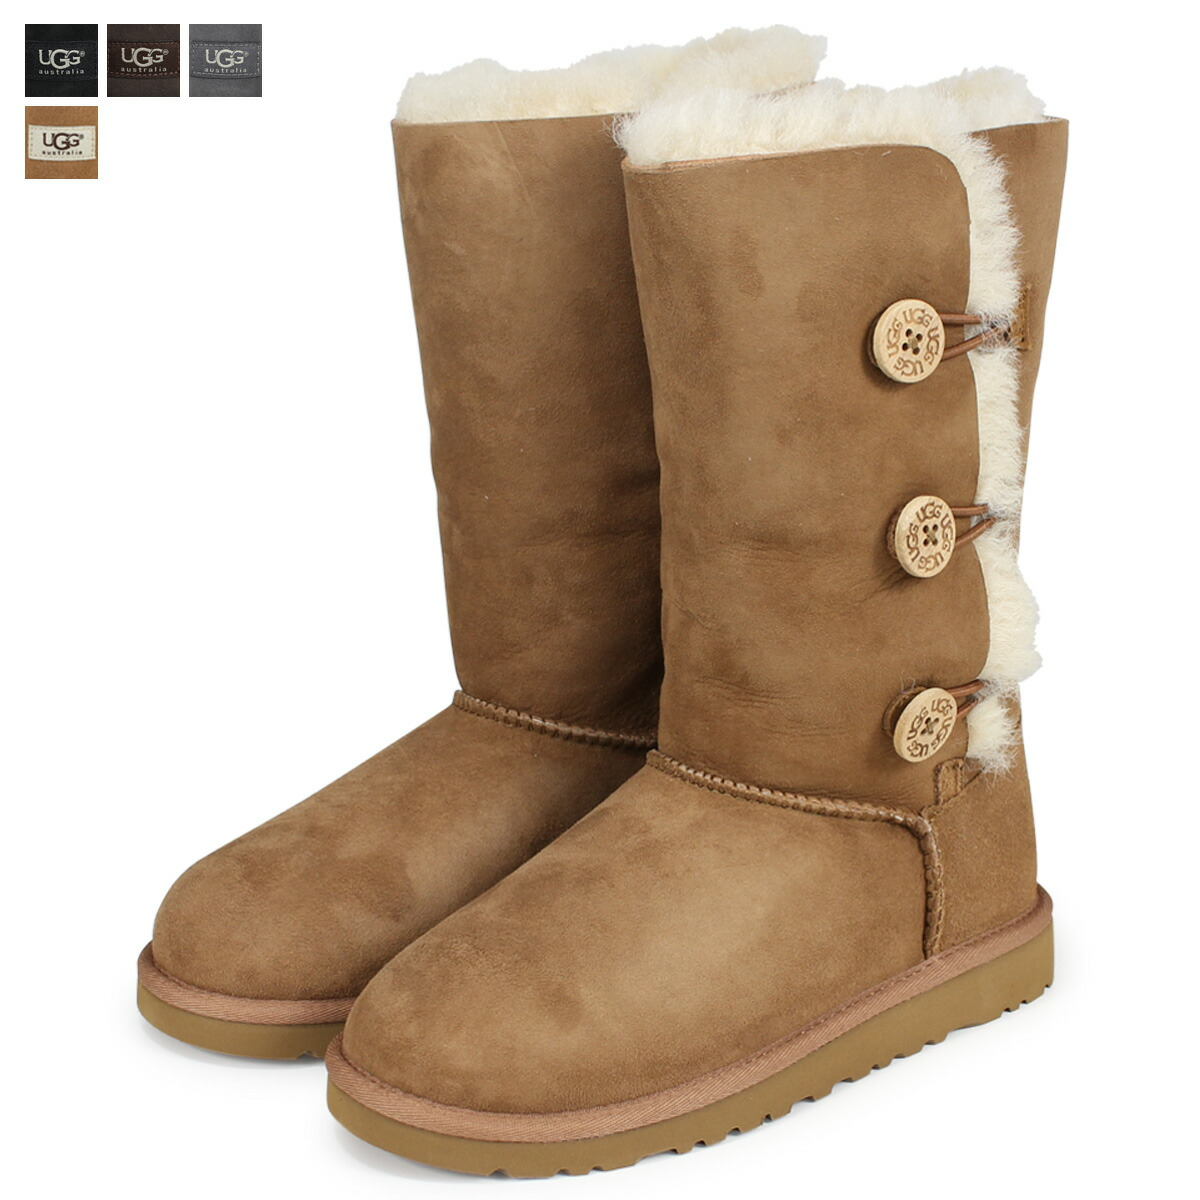 a452bd6f7cc アグ UGG kids Bailey button mouton boots KIDS BAILEY BUTTON TRIPLET 1962K  sheepskin